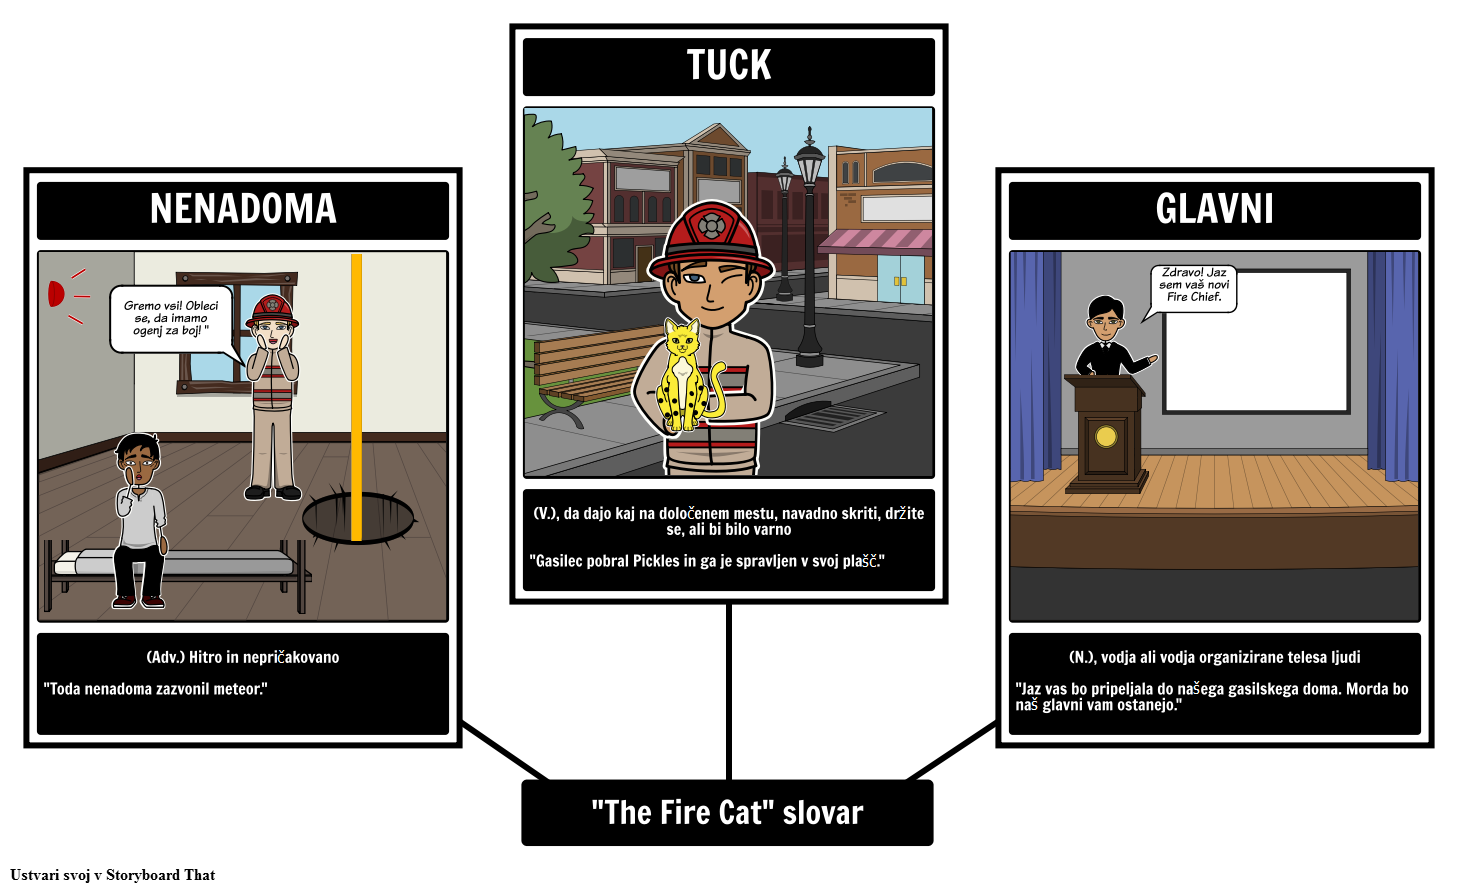 The Fire Cat Slovar